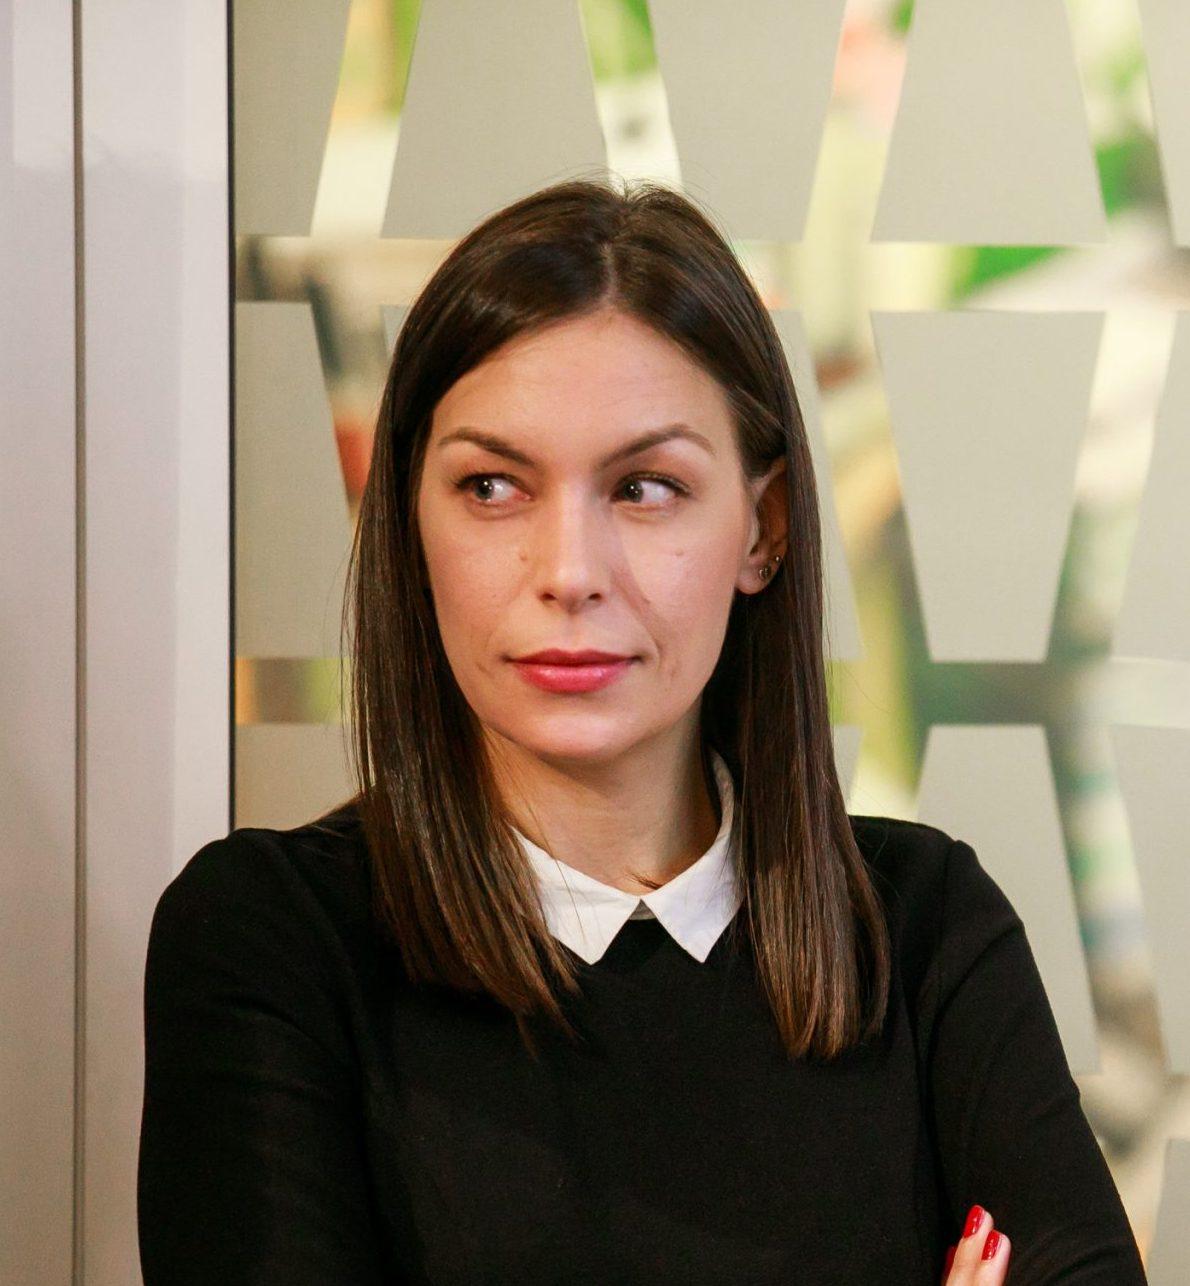 "<img src=""https://www.industrijavideosadrzaja.com/wp-content/uploads/2021/06/logo-Petlja-logo.png""width=""100""height=""100""><br>Katarina Anđelković"